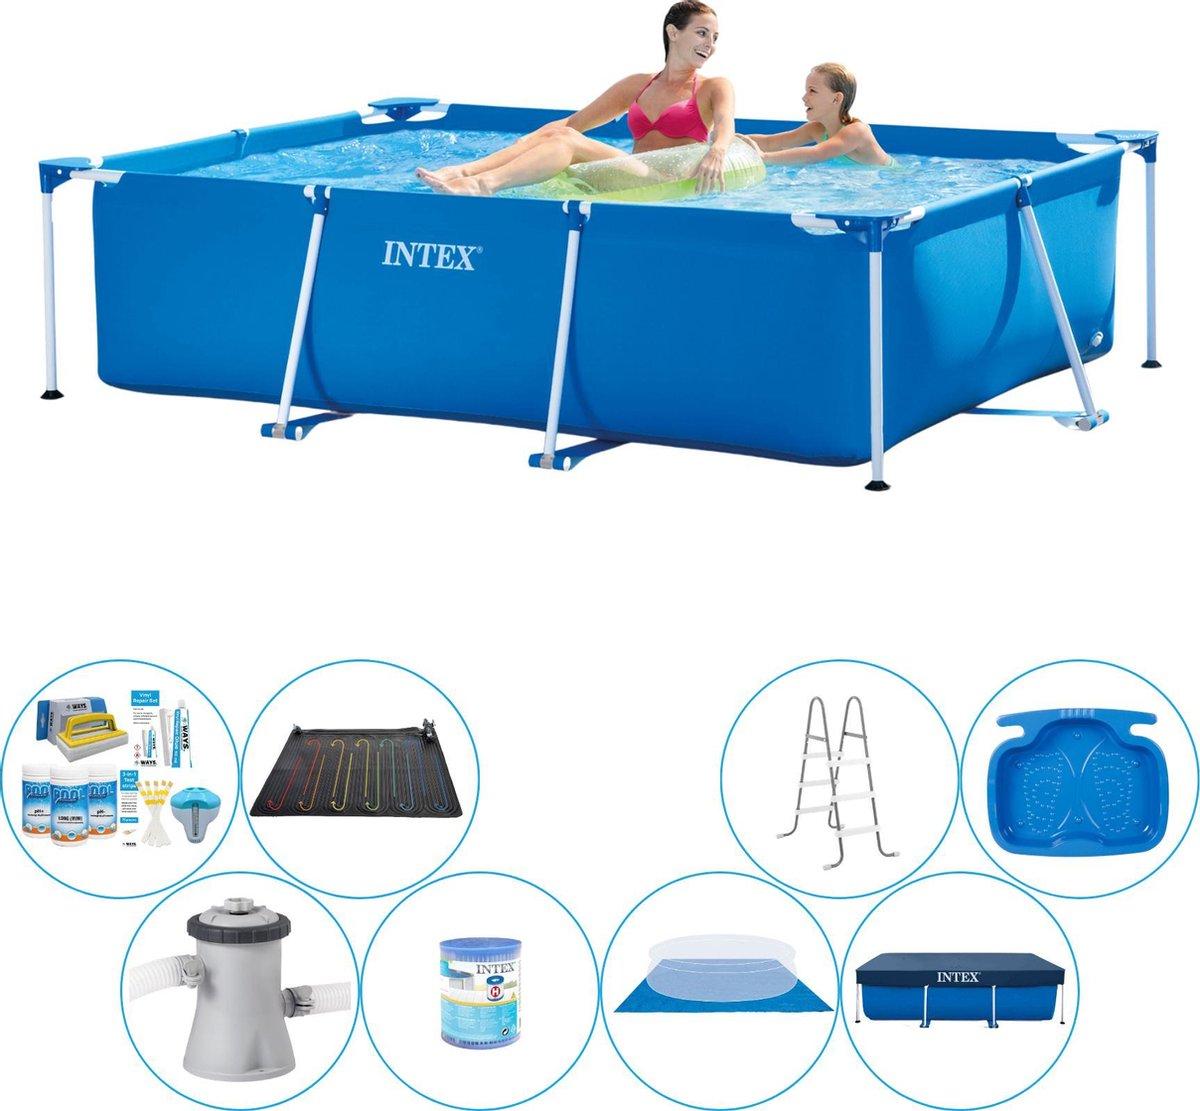 Intex Frame Pool Rechthoekig 220x150x60 cm - Zwembad Super Deal